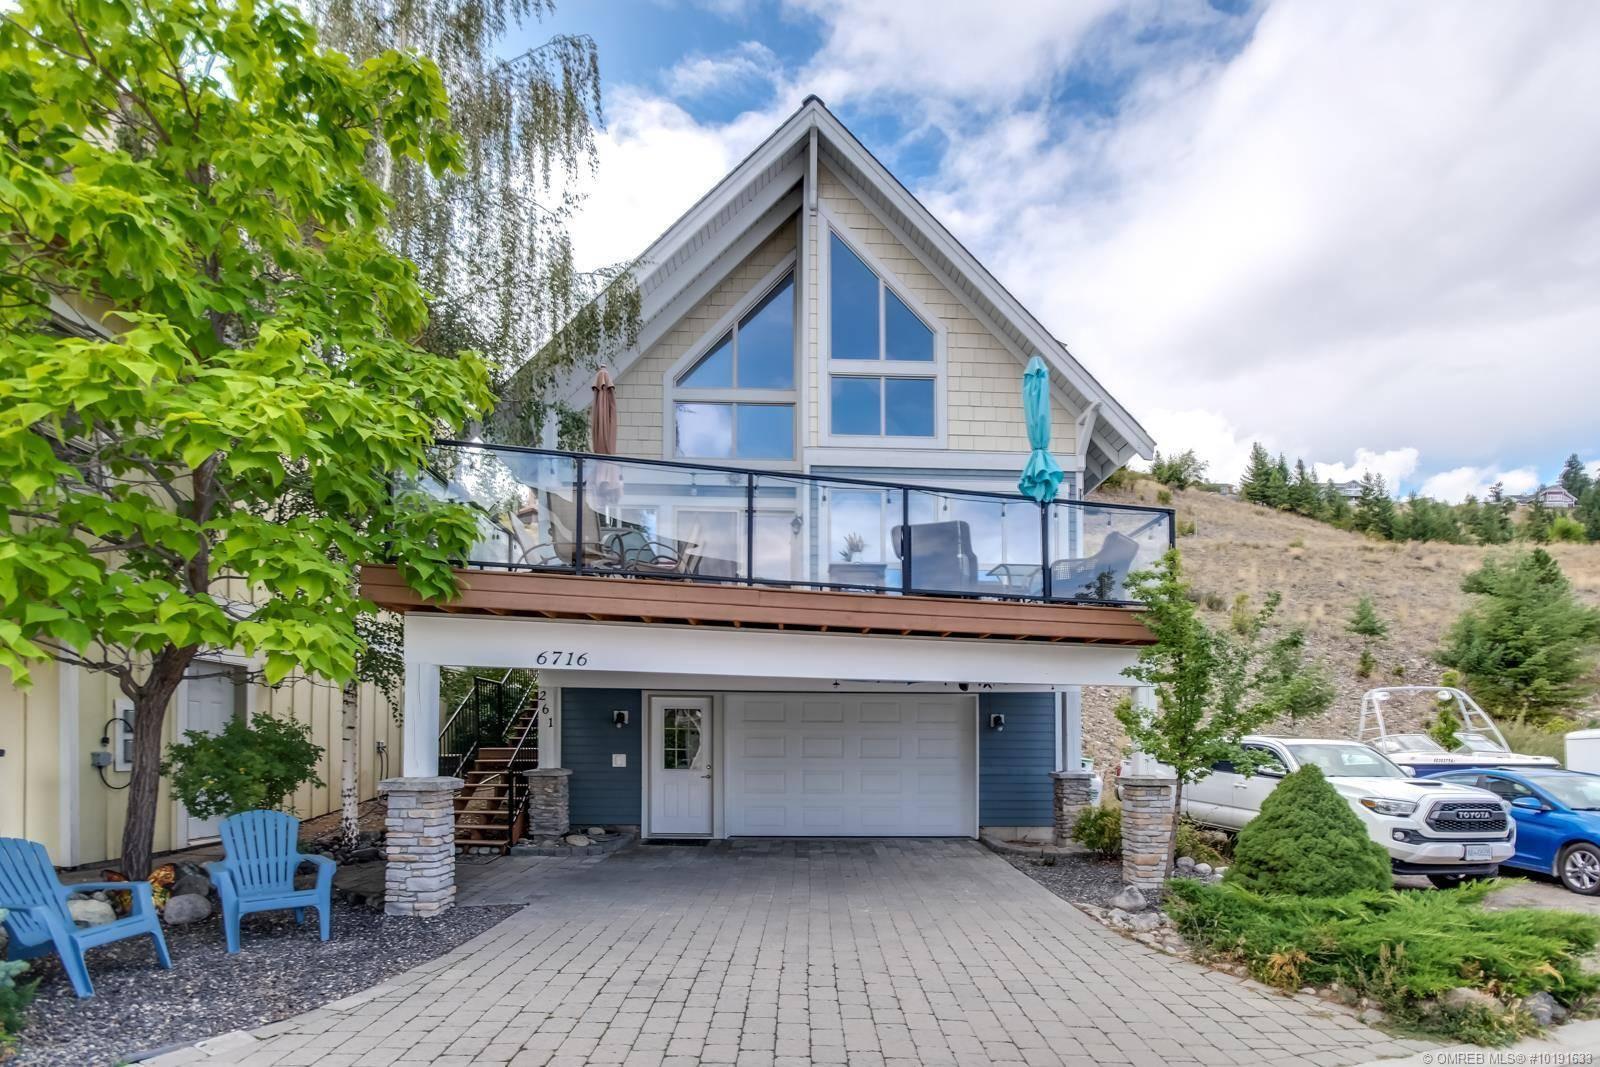 House for sale at 6716 La Palma Lp Unit 261 Kelowna British Columbia - MLS: 10191633